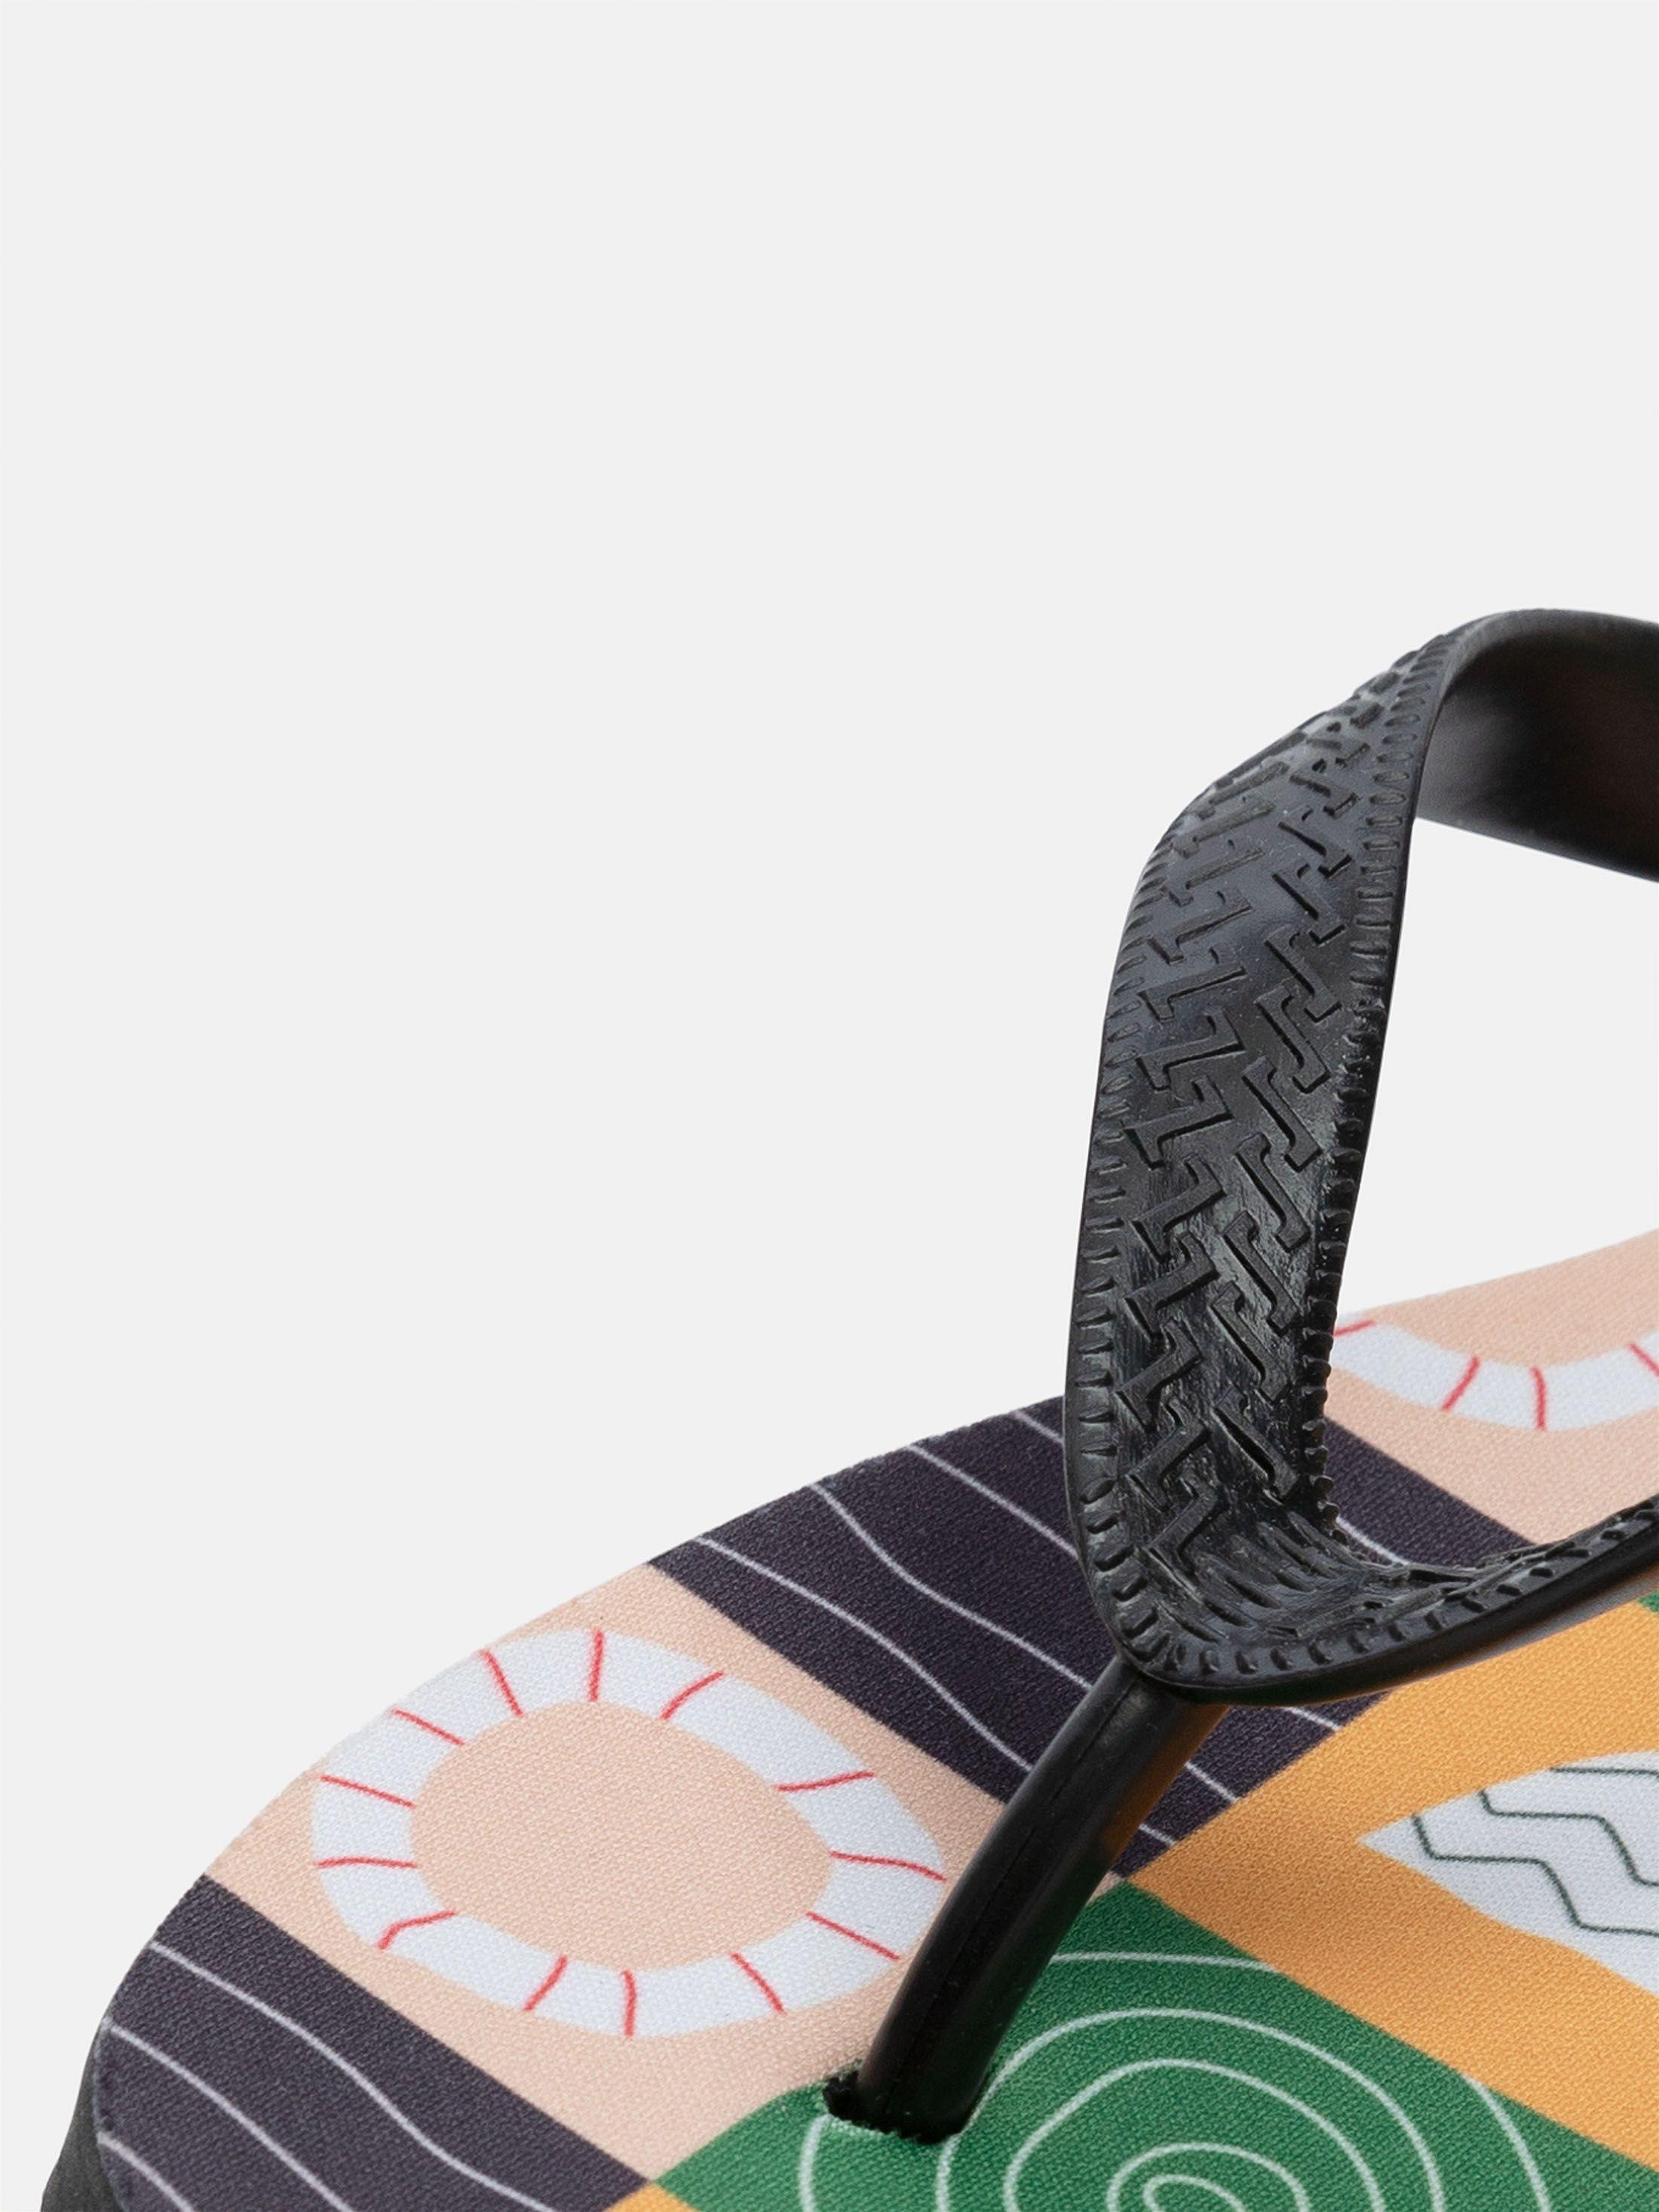 Printed Flip Flops For Kids